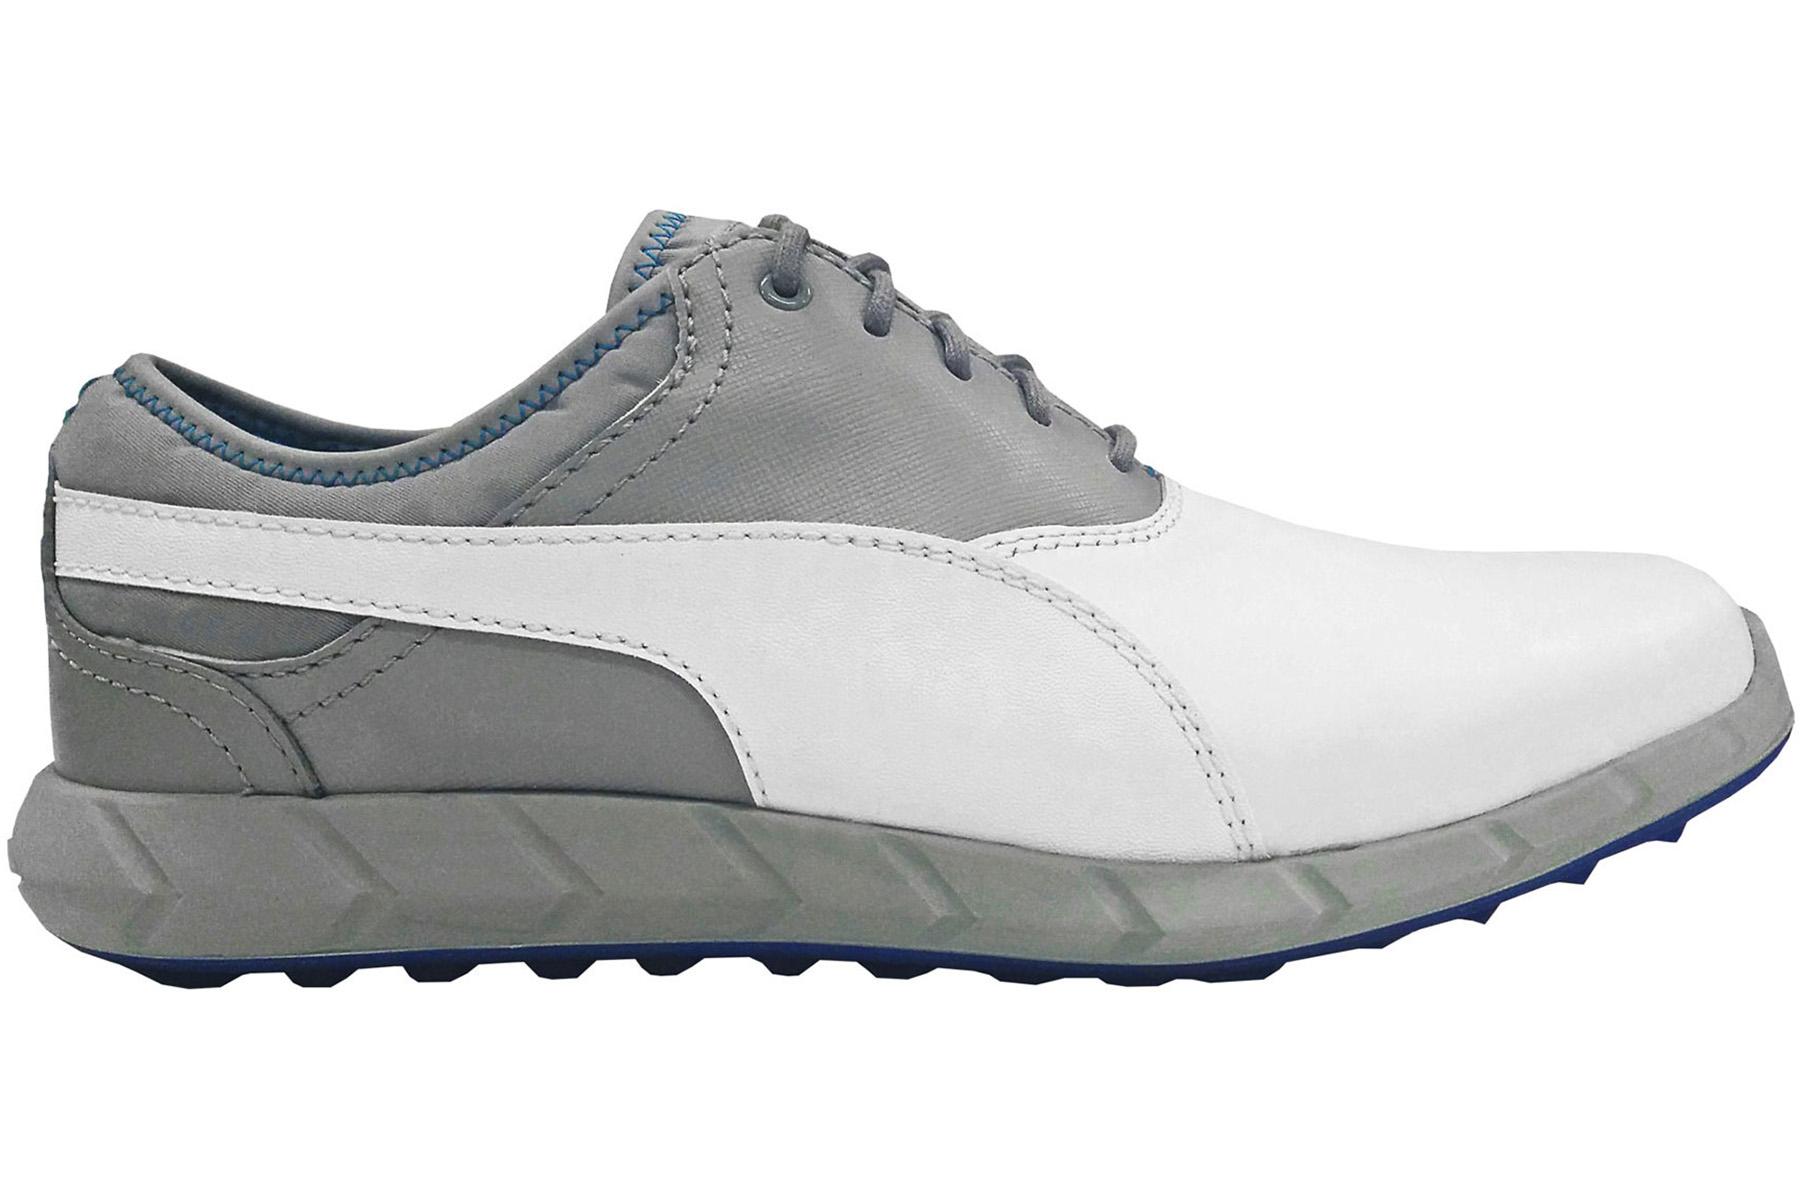 Puma Golf Shoes Clearance Sale Uk